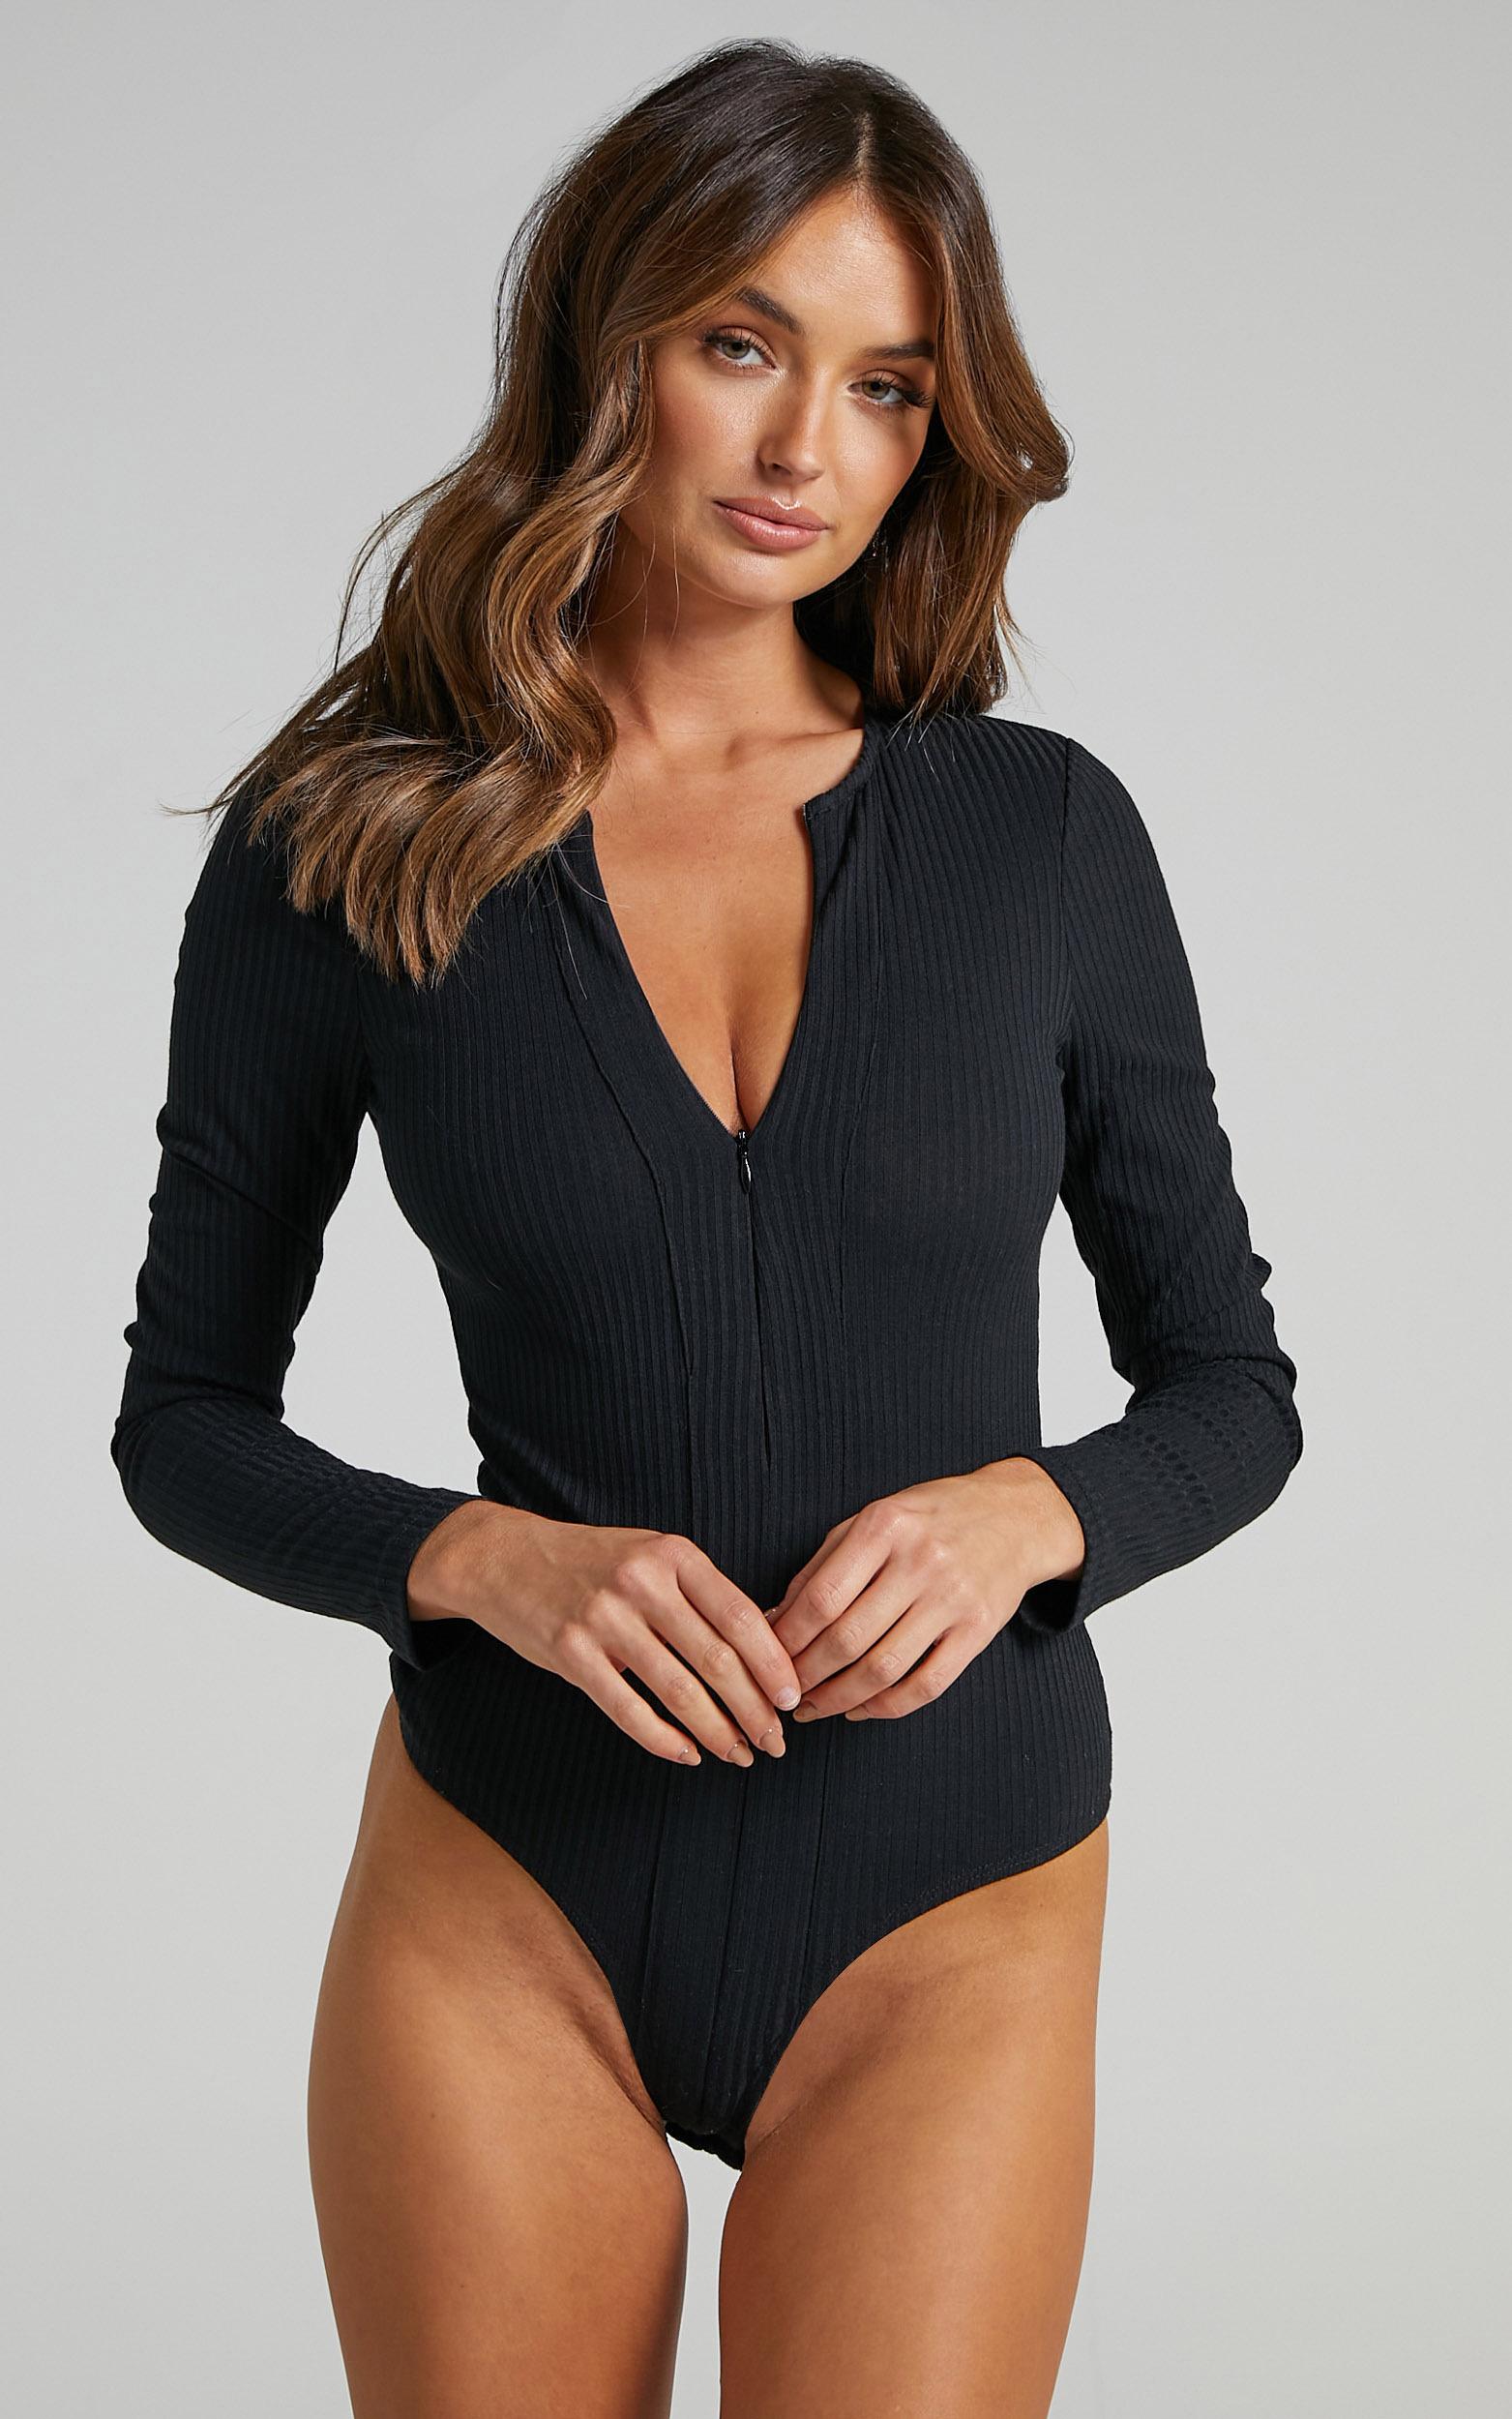 Mahony Longsleeve Rib Bodysuit in Black - 04, BLK1, hi-res image number null